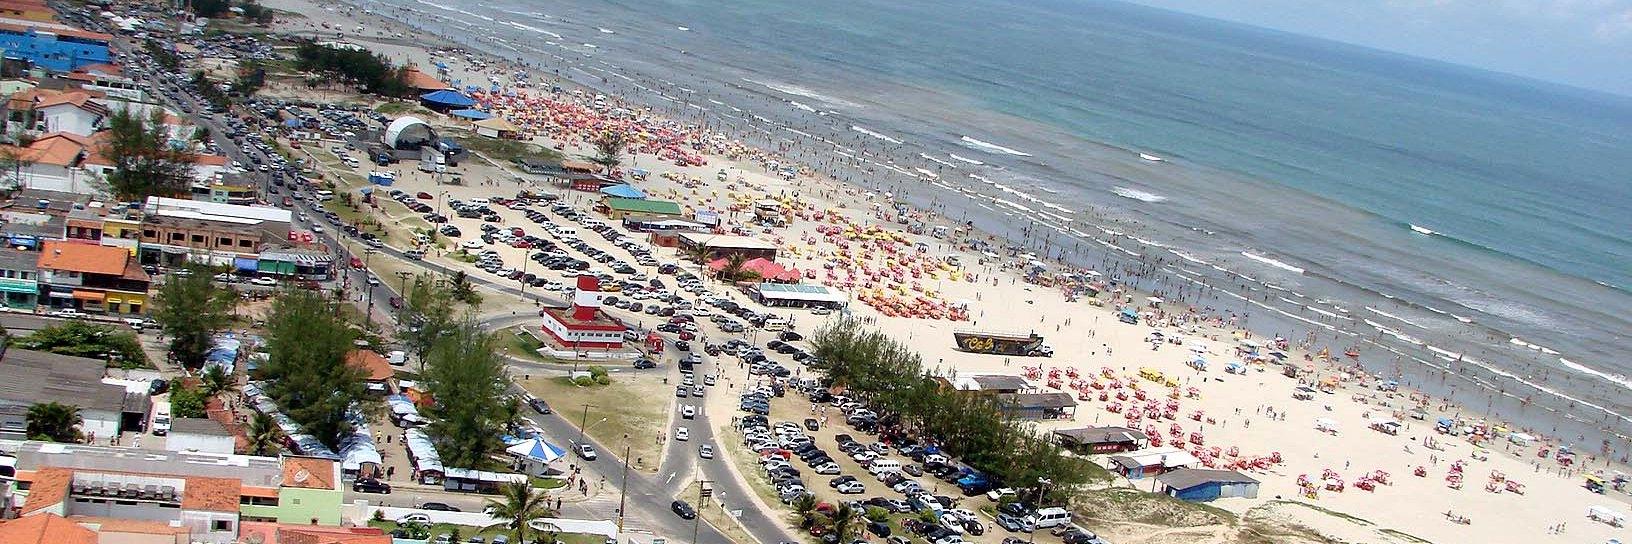 Hotel Cardoso De Ilha Comprida Conheca Melhor Ilha Comprida